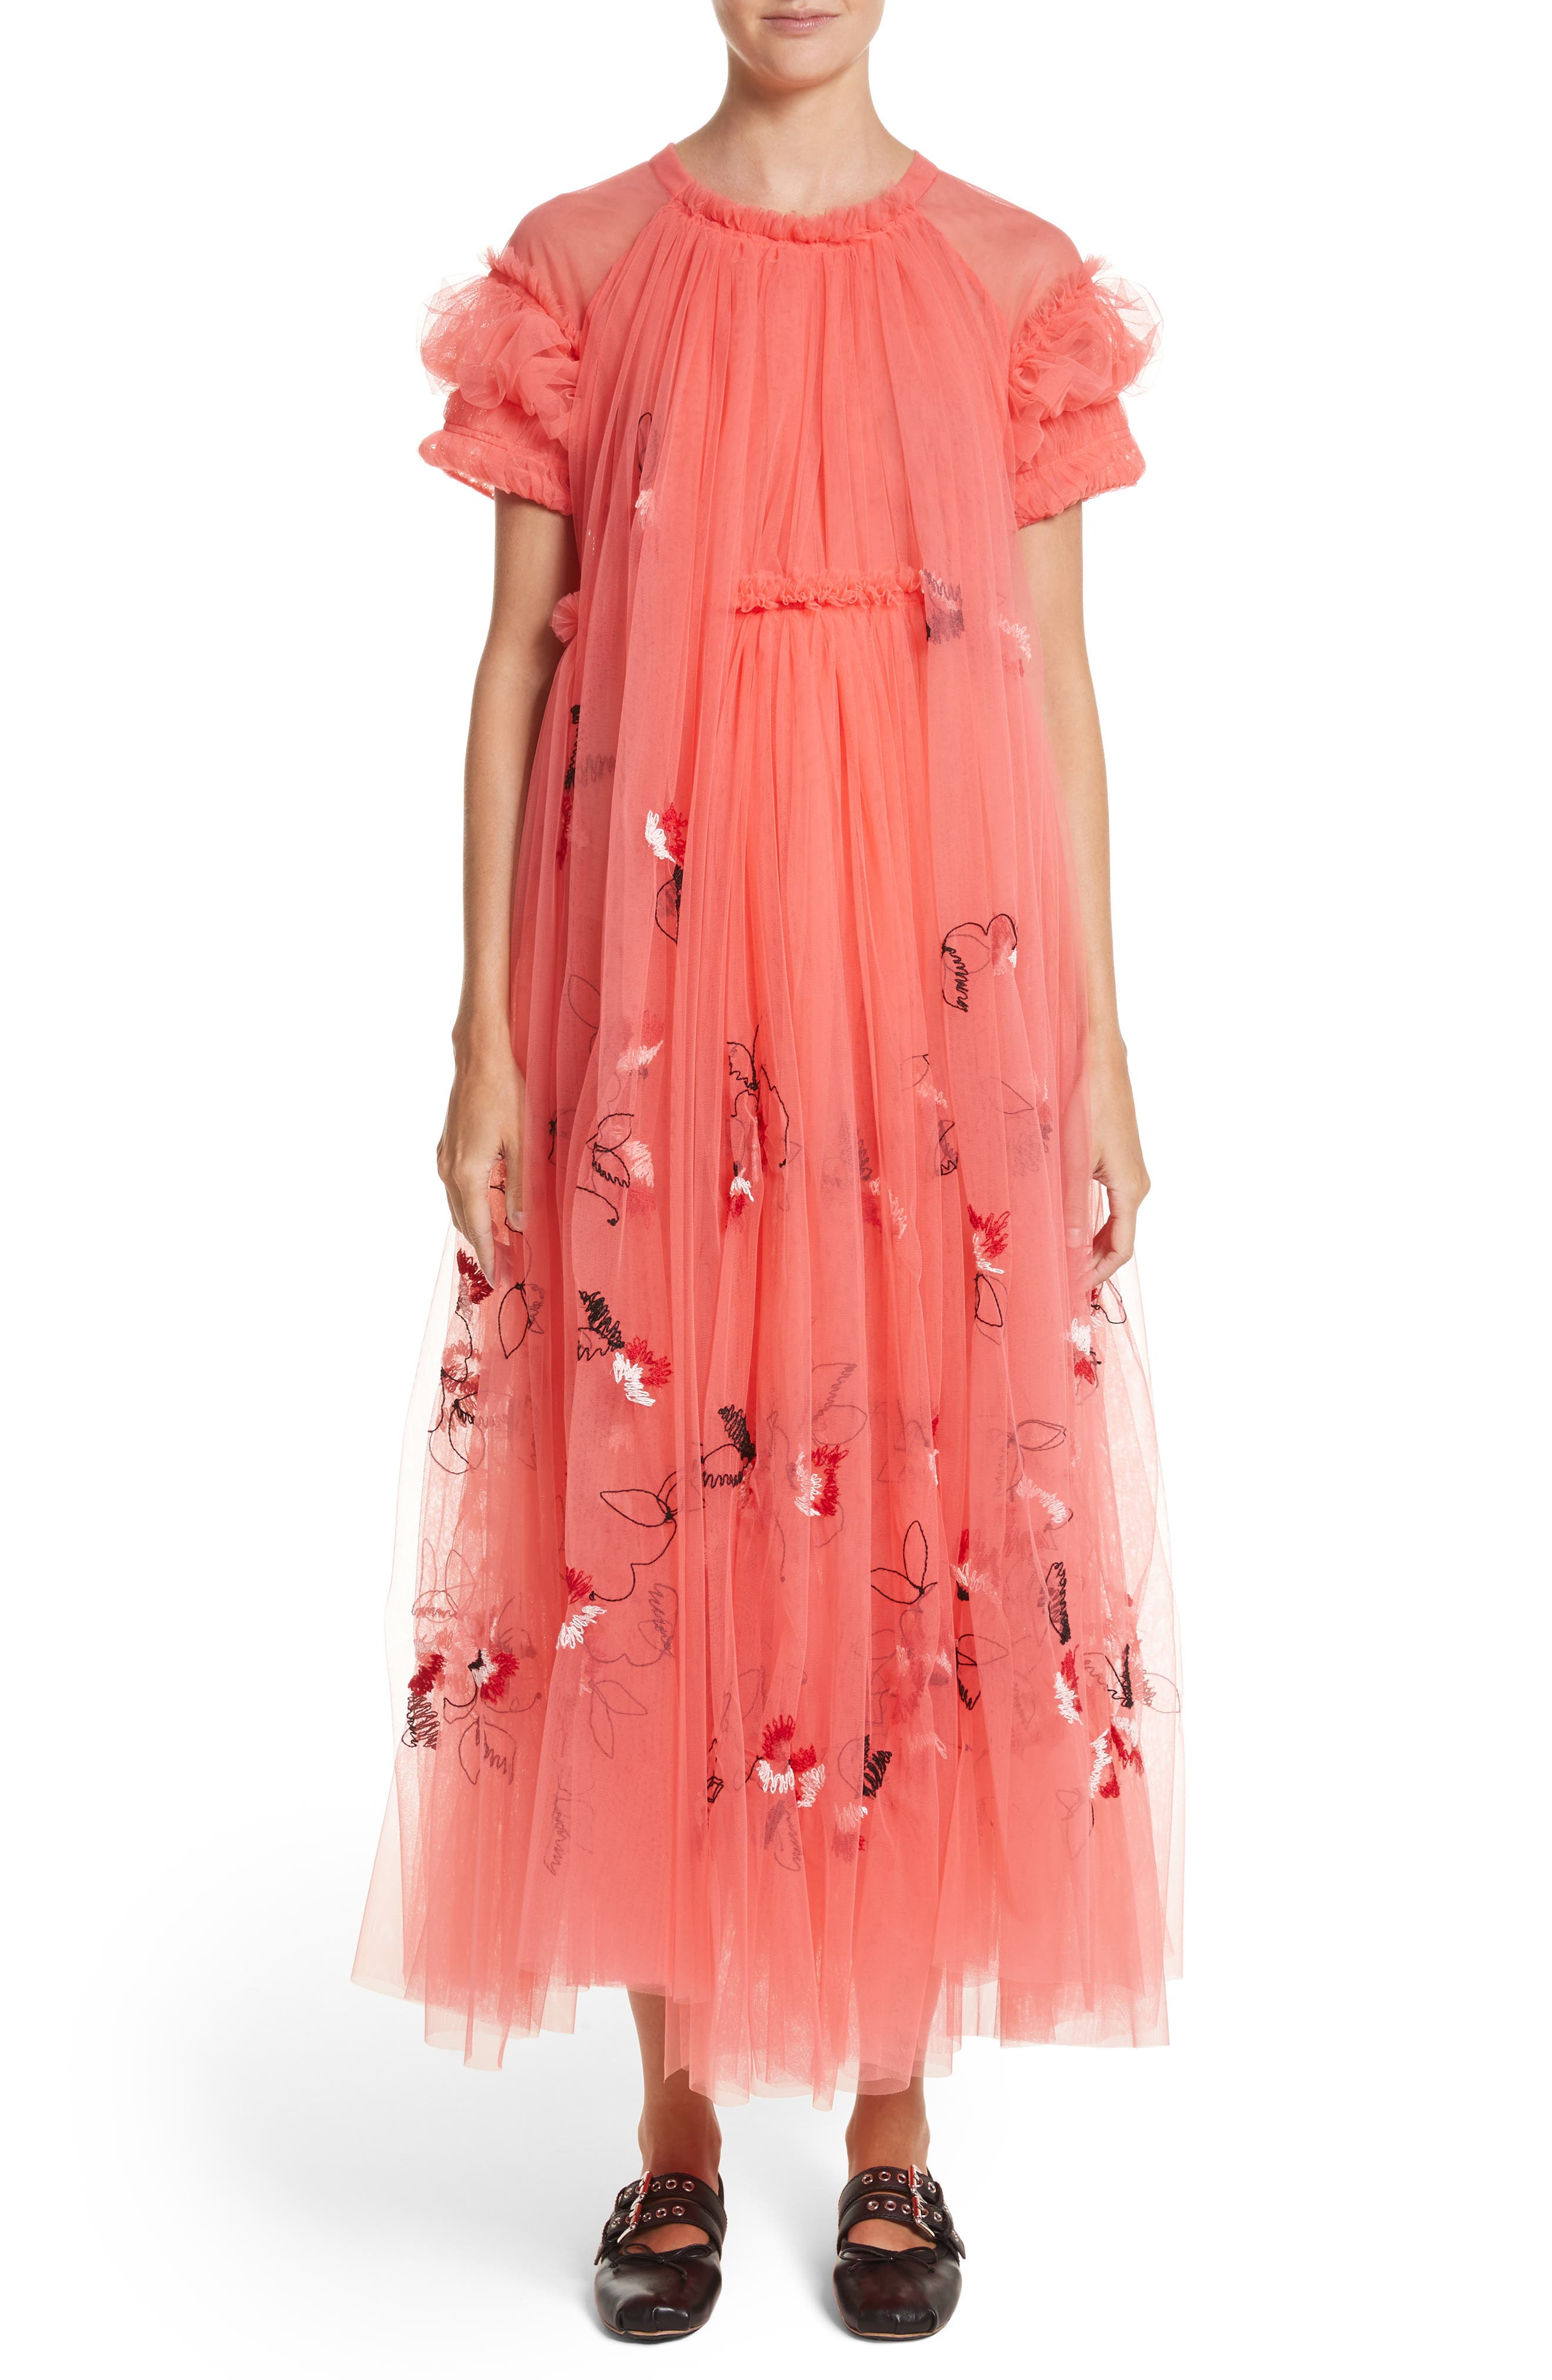 Alternate Image 1 Selected - Molly Goddard Doris Embroidered Tulle Dress